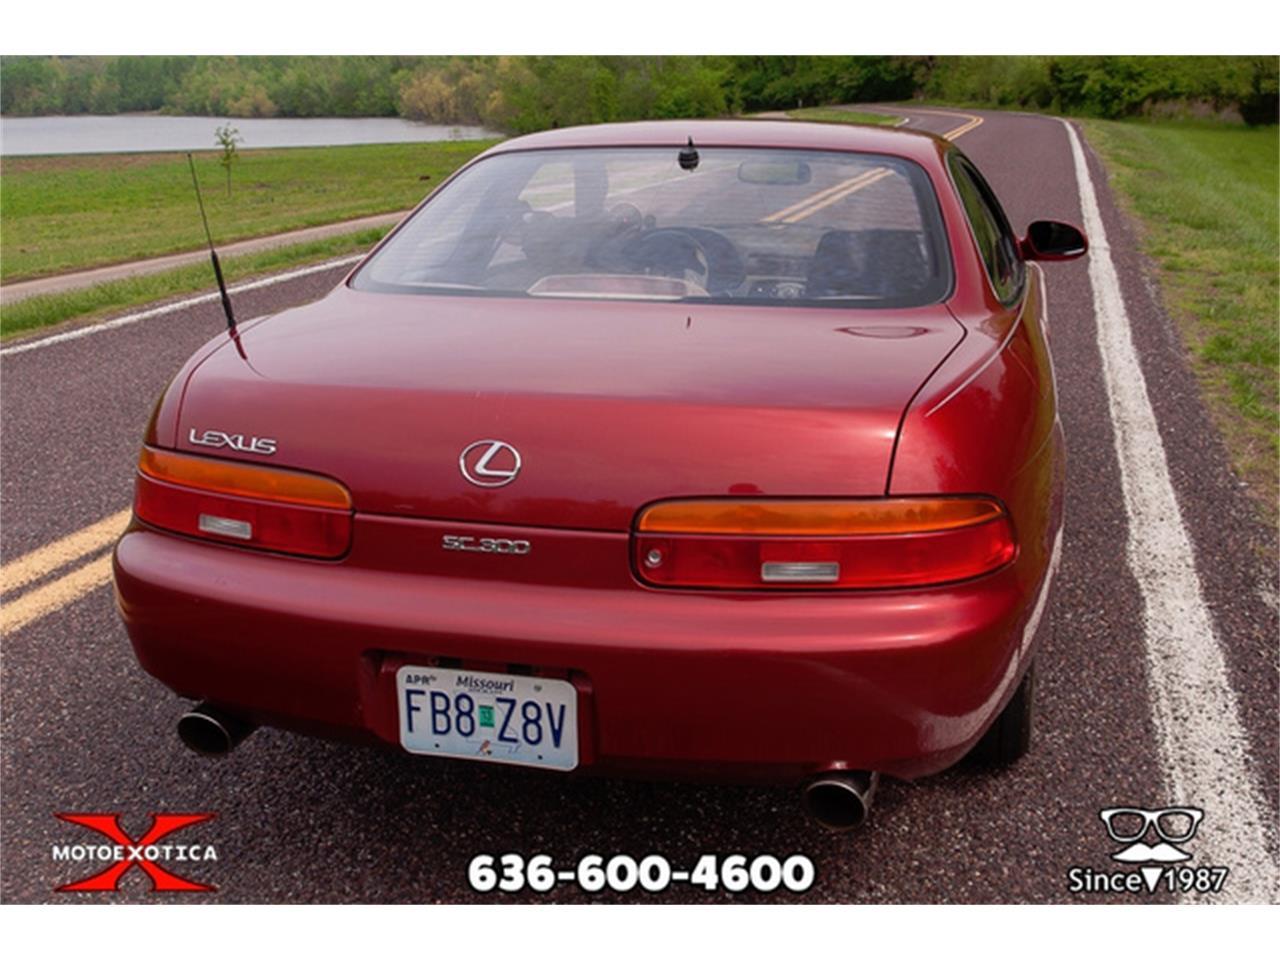 For Sale: 1992 Lexus SC300 in St  Louis, Missouri